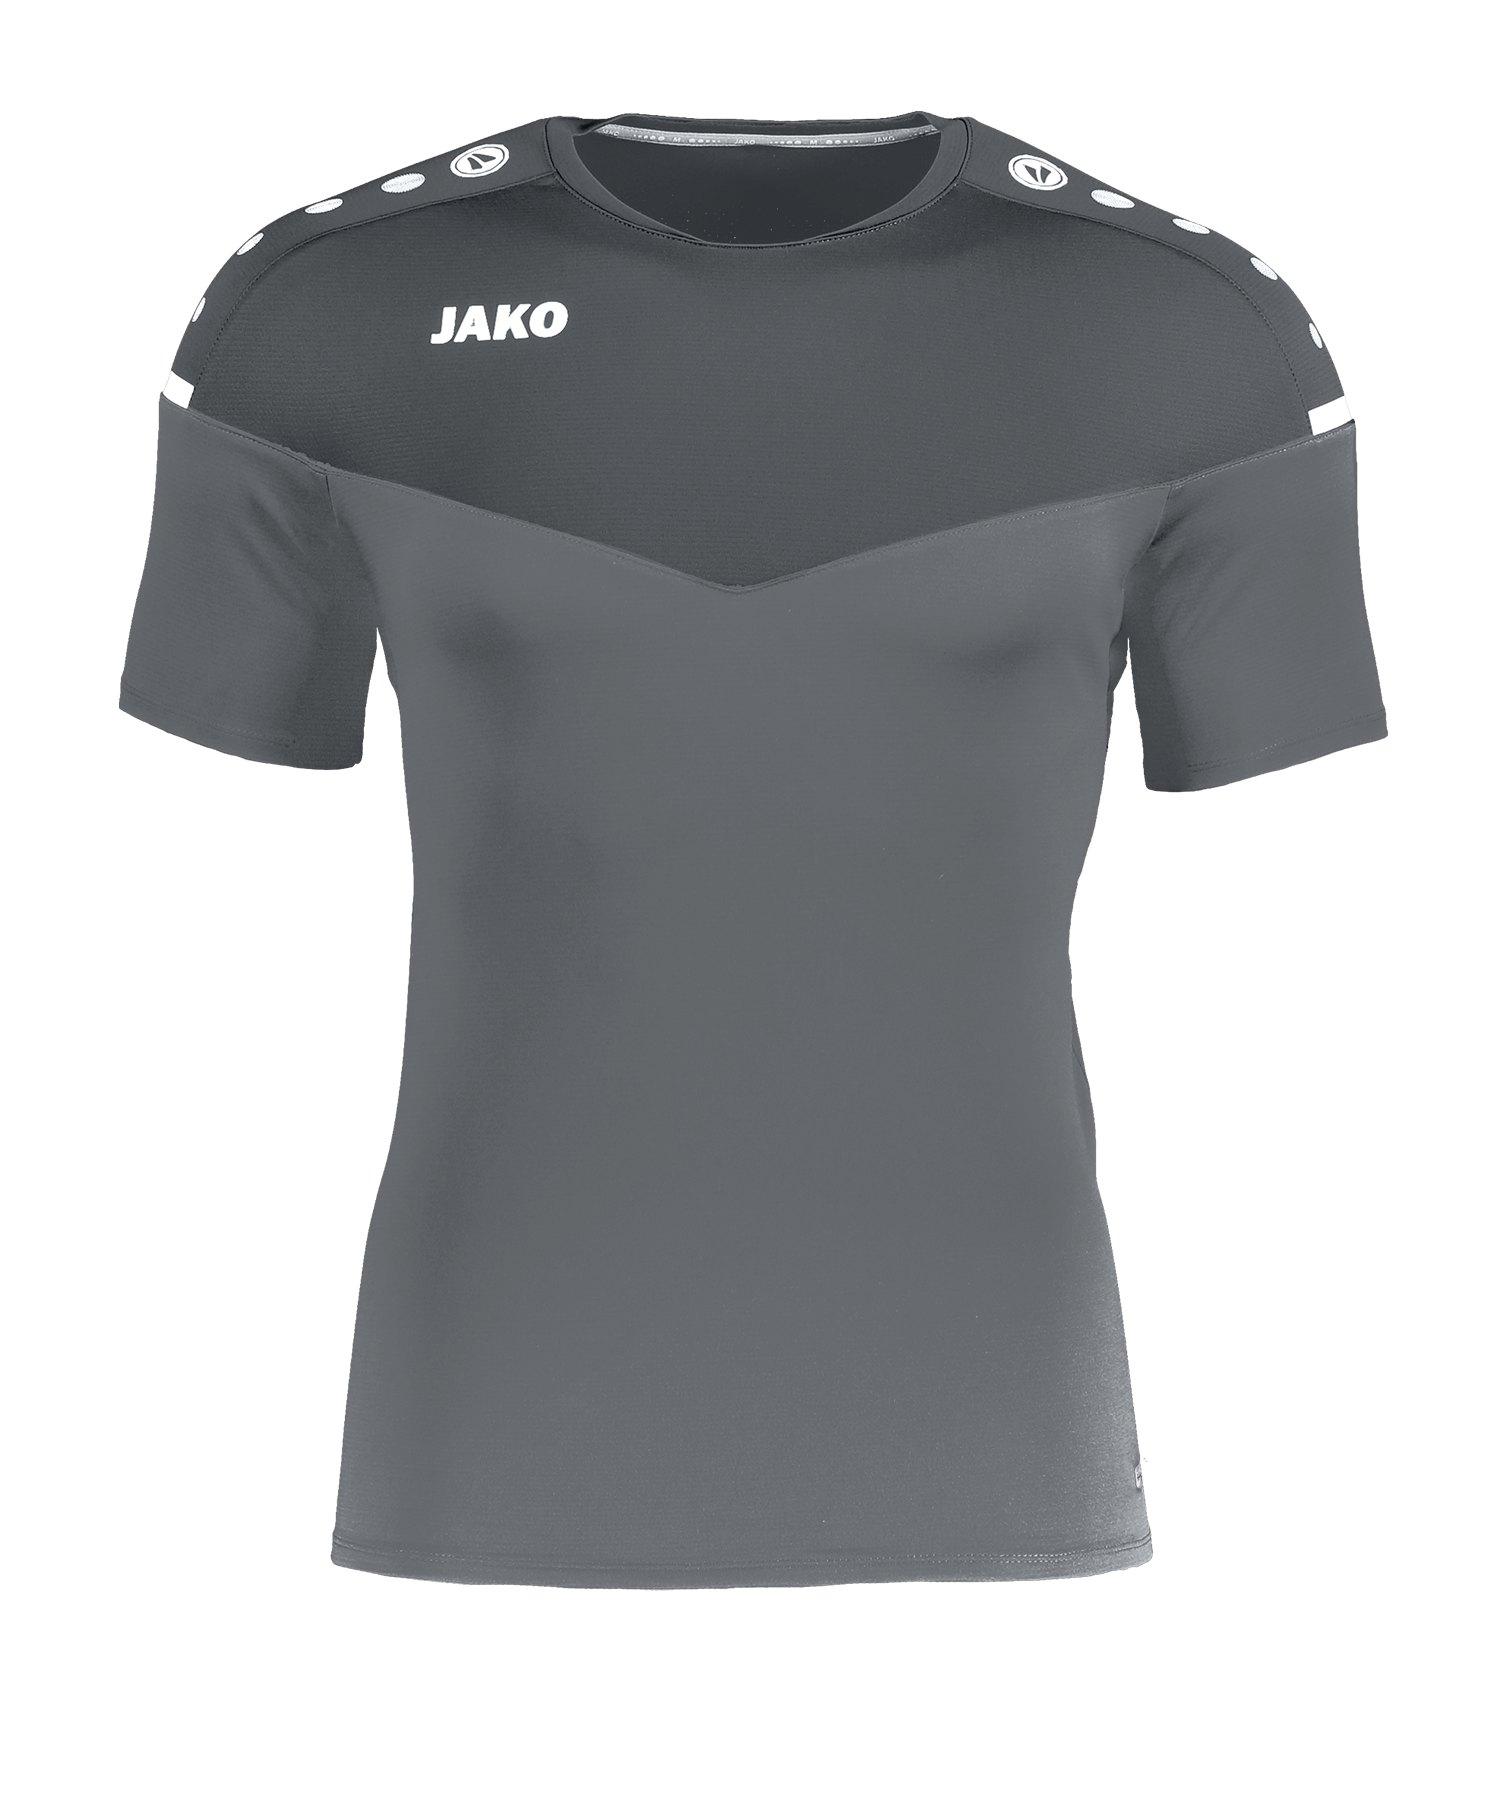 Jako Champ 2.0 T-Shirt Kids Grau F40 - grau